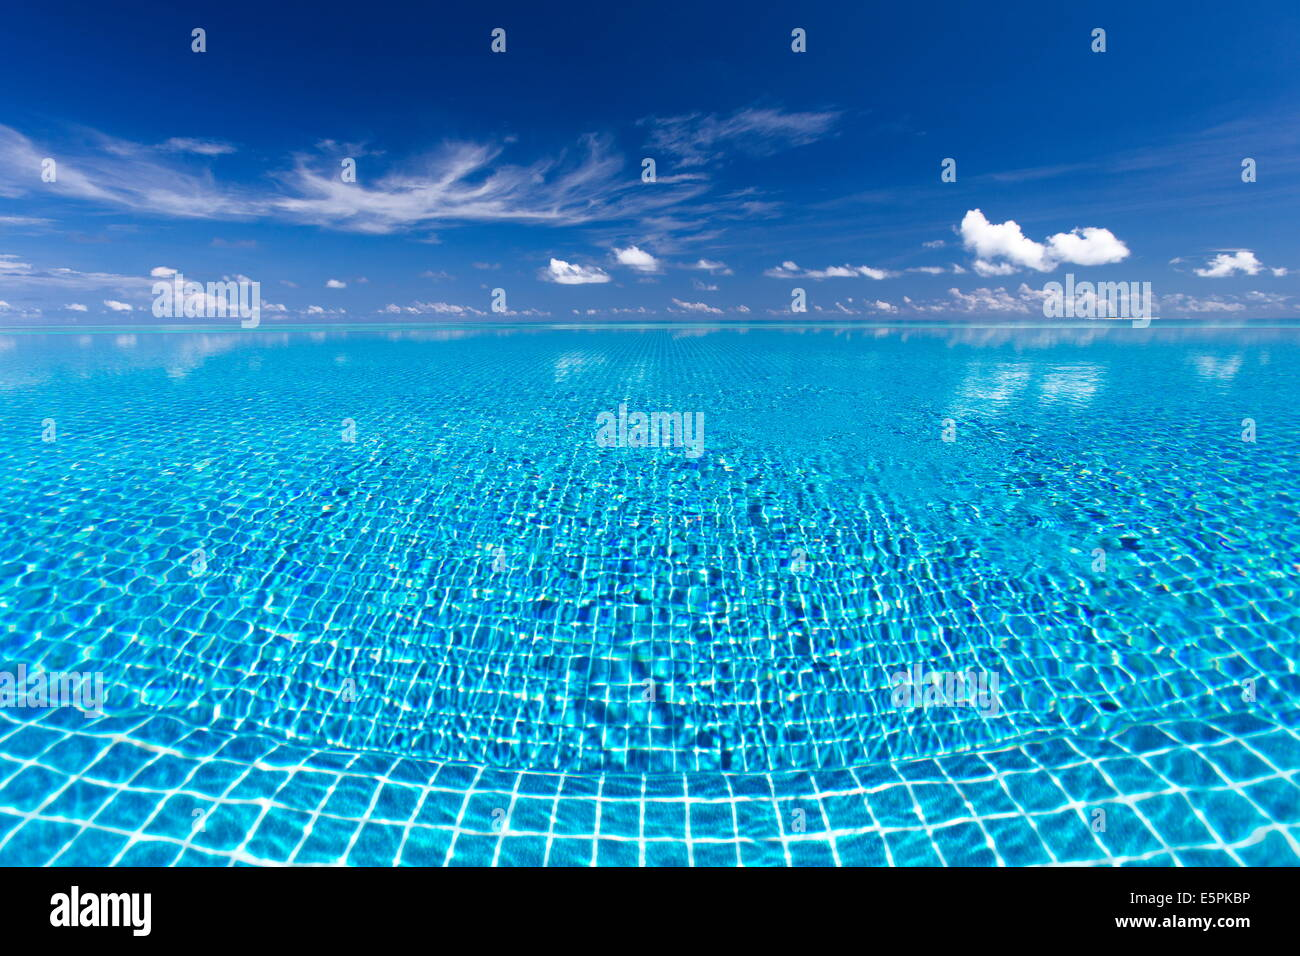 Piscina Infinity, Maldive, Oceano Indiano, Asia Immagini Stock